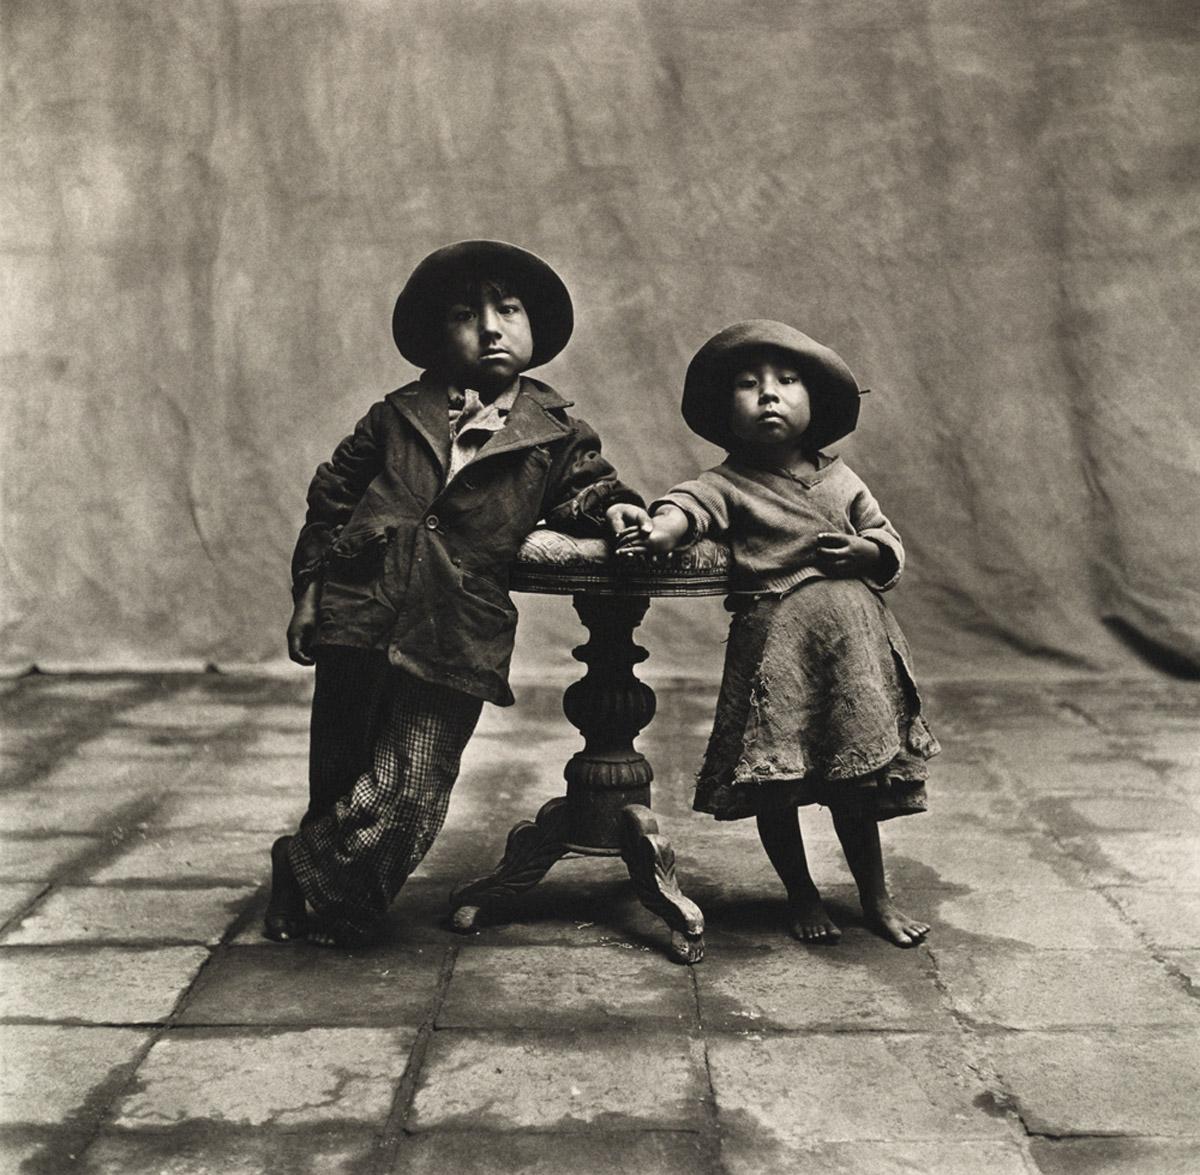 Cuzco Children, 1948 © Condé Nast